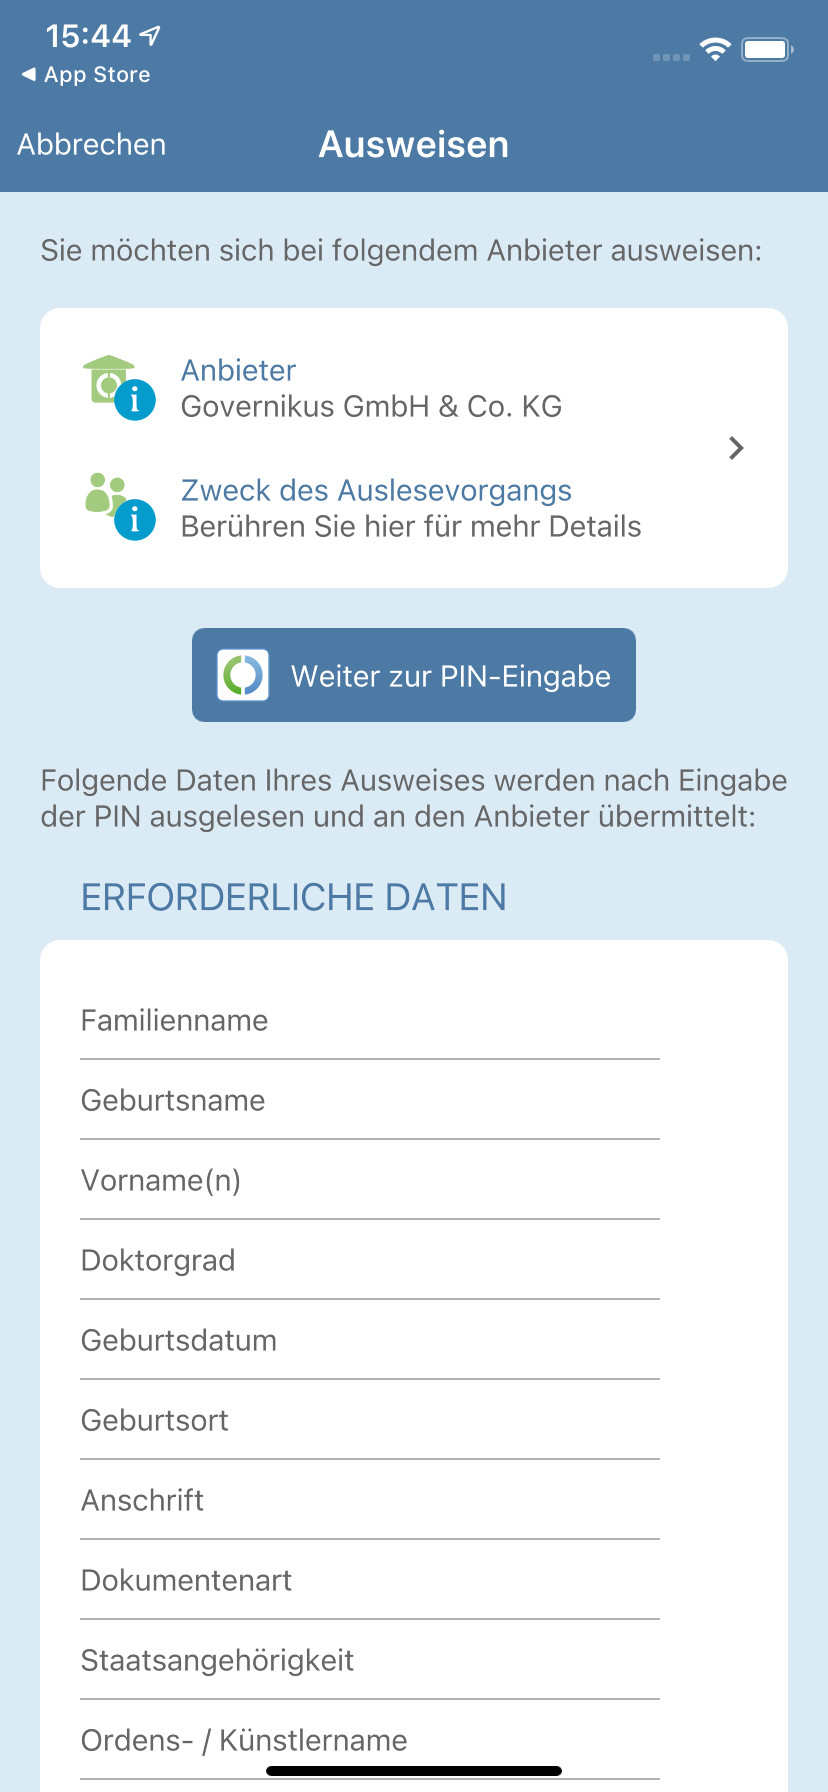 Screenshot 1 - AusweisApp2 (App für iPhone & iPad)